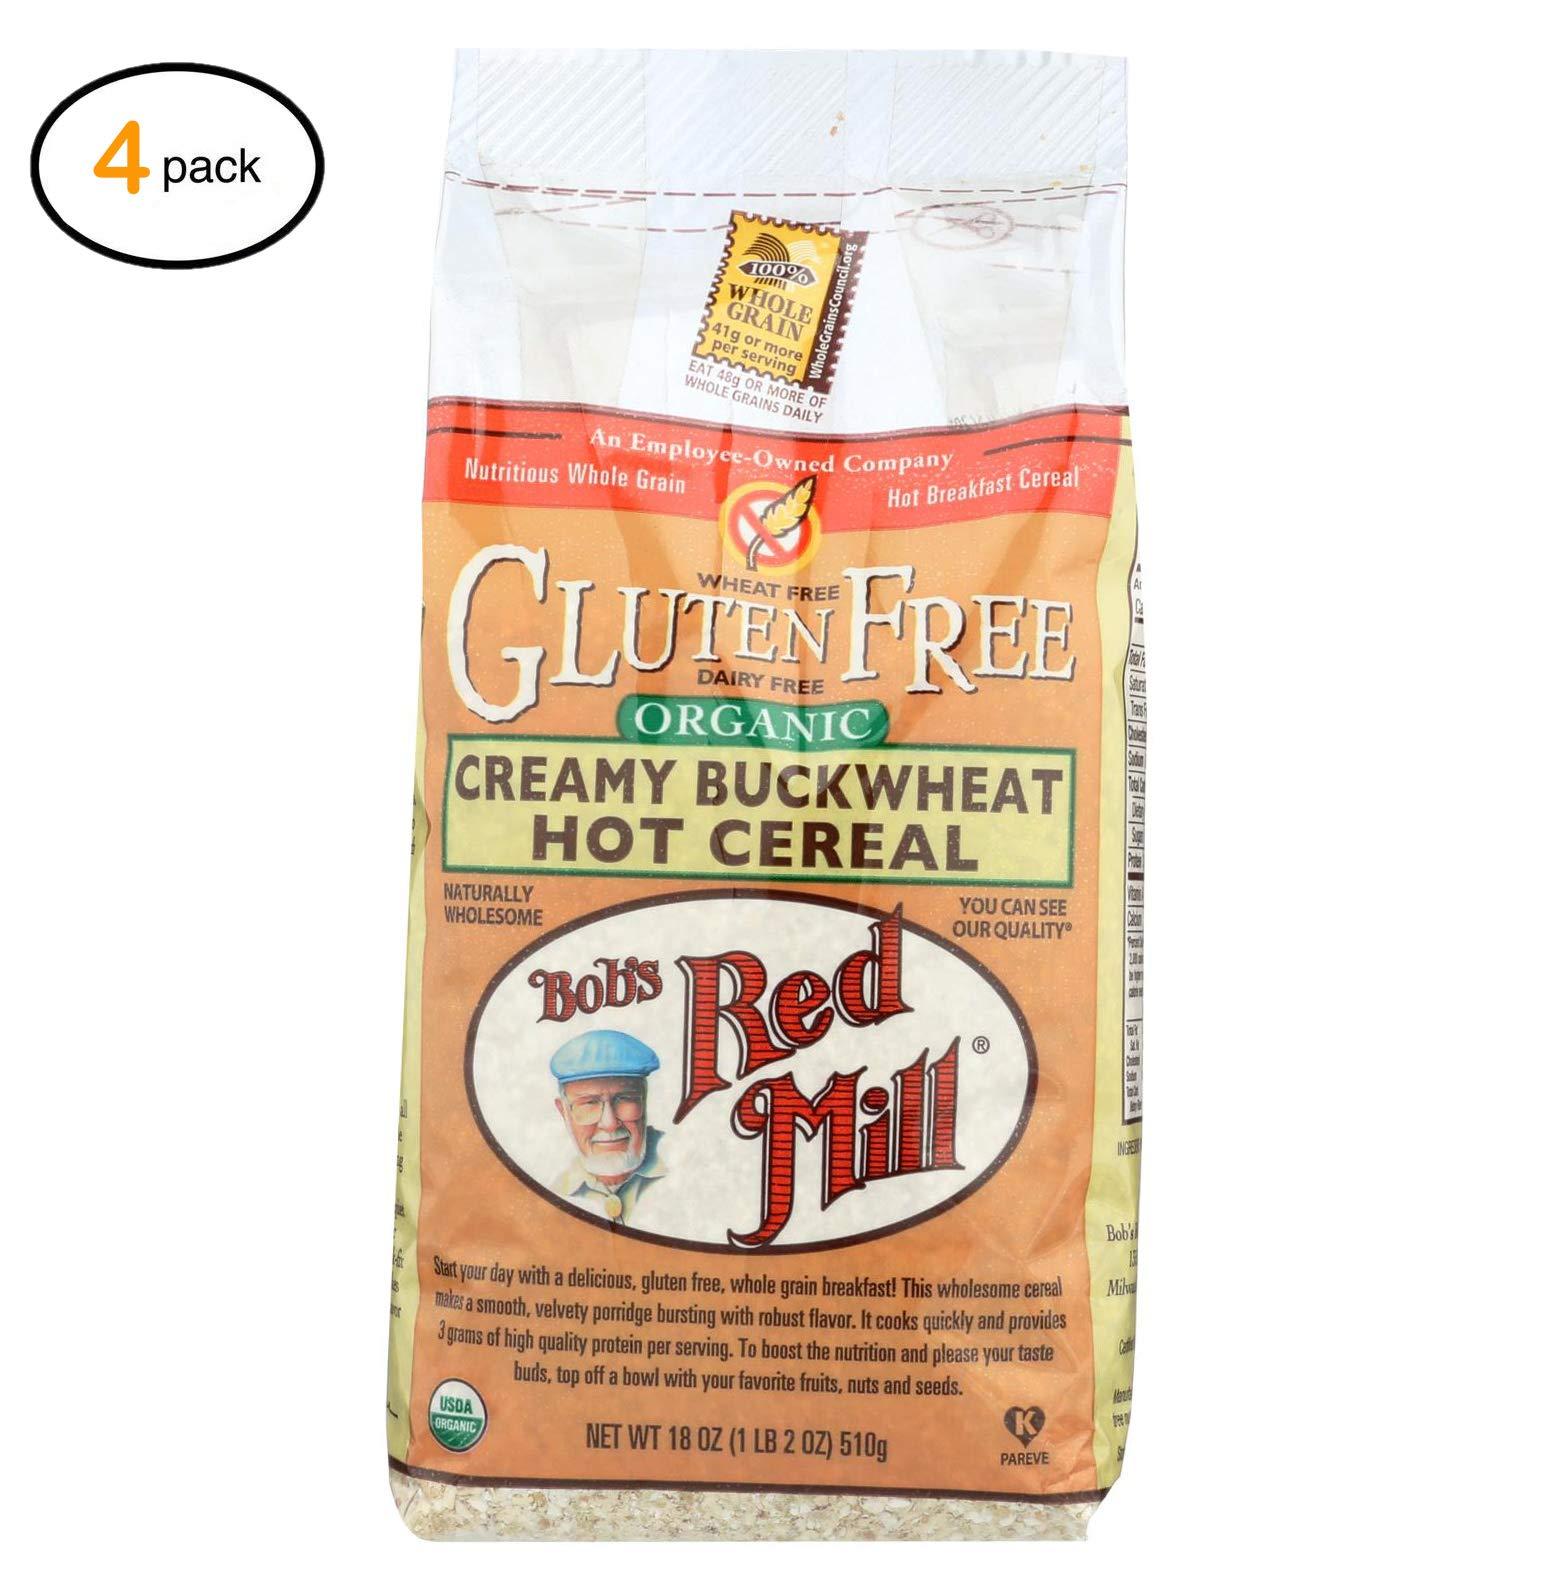 Bоb's Rеd Mill оrganic Glutеn Frее Crеamy Buckwhеat Hоt Cеrеal - 18 оz - Casе оf 4 - Bulk Buy